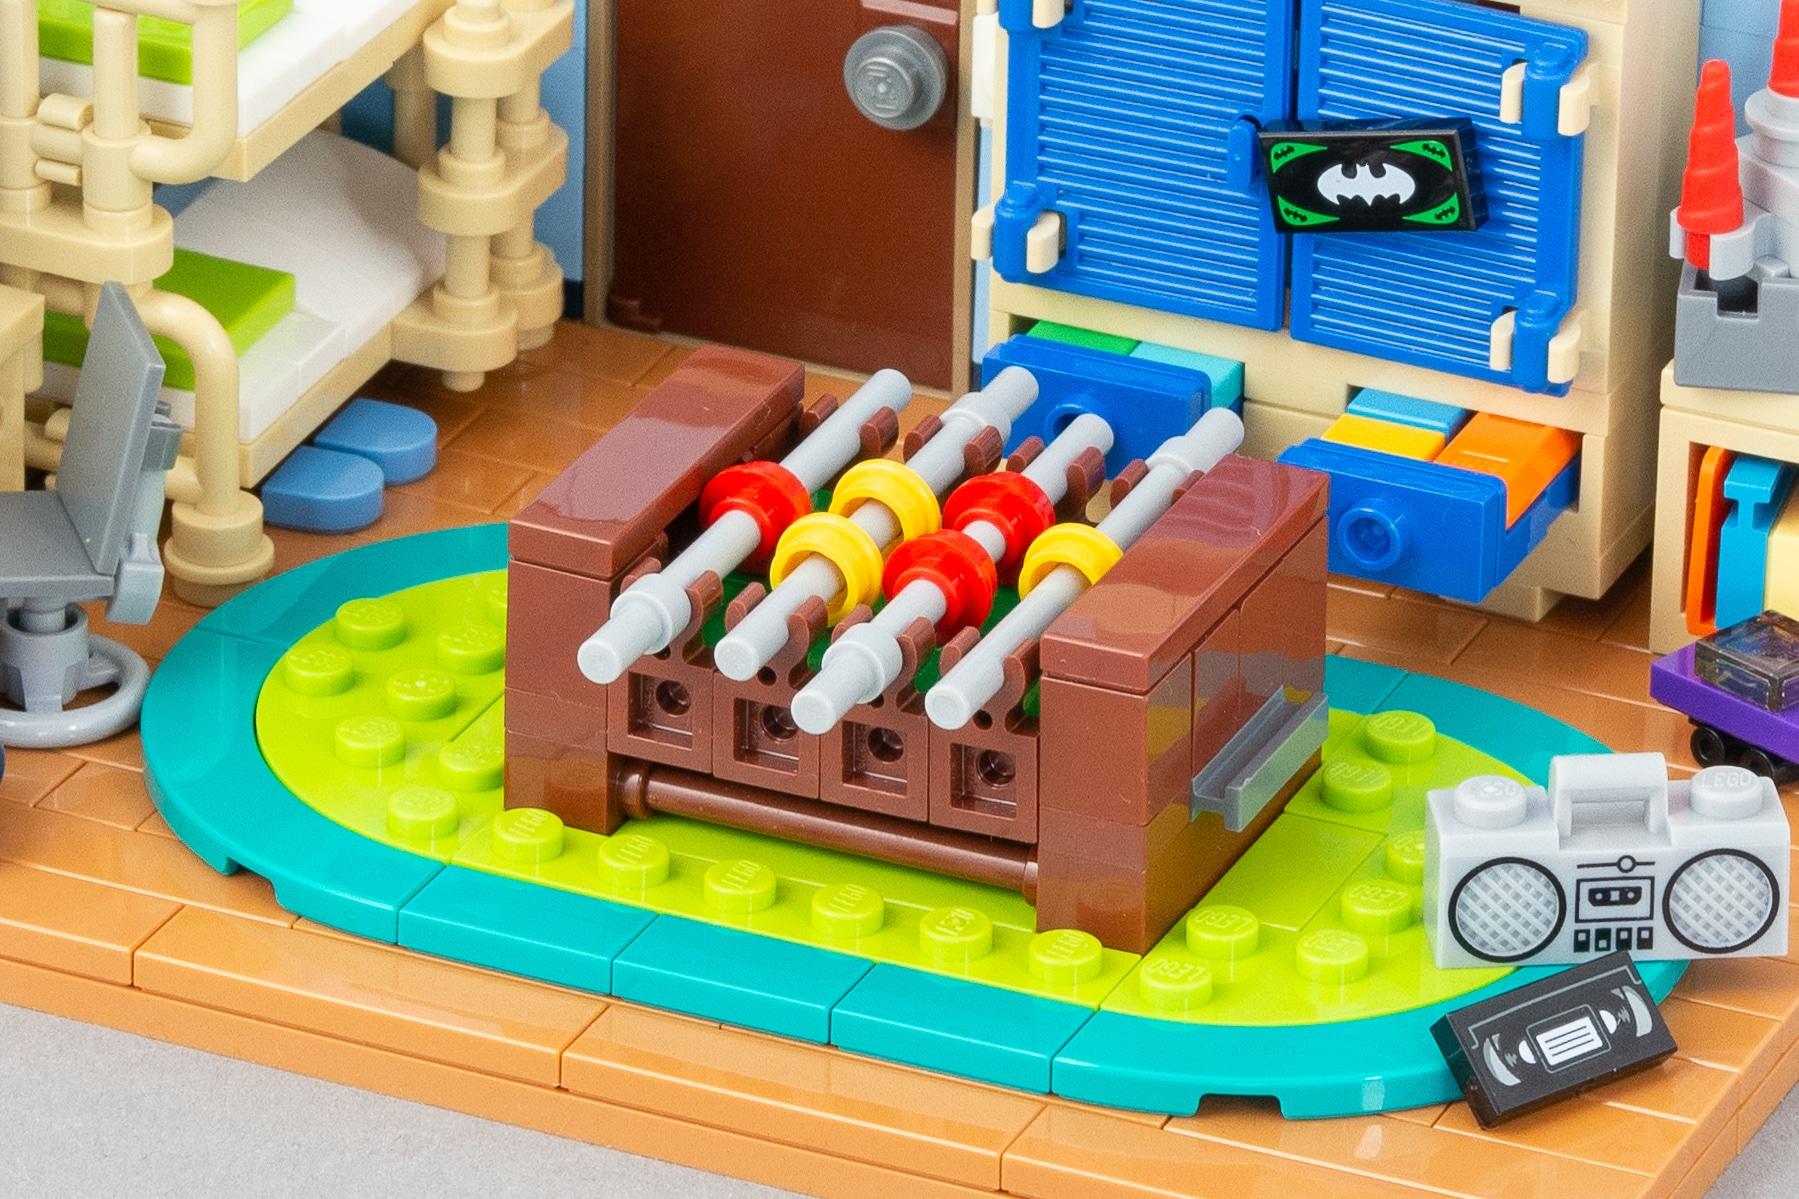 LEGO Kinderzimmer Kicker MOC